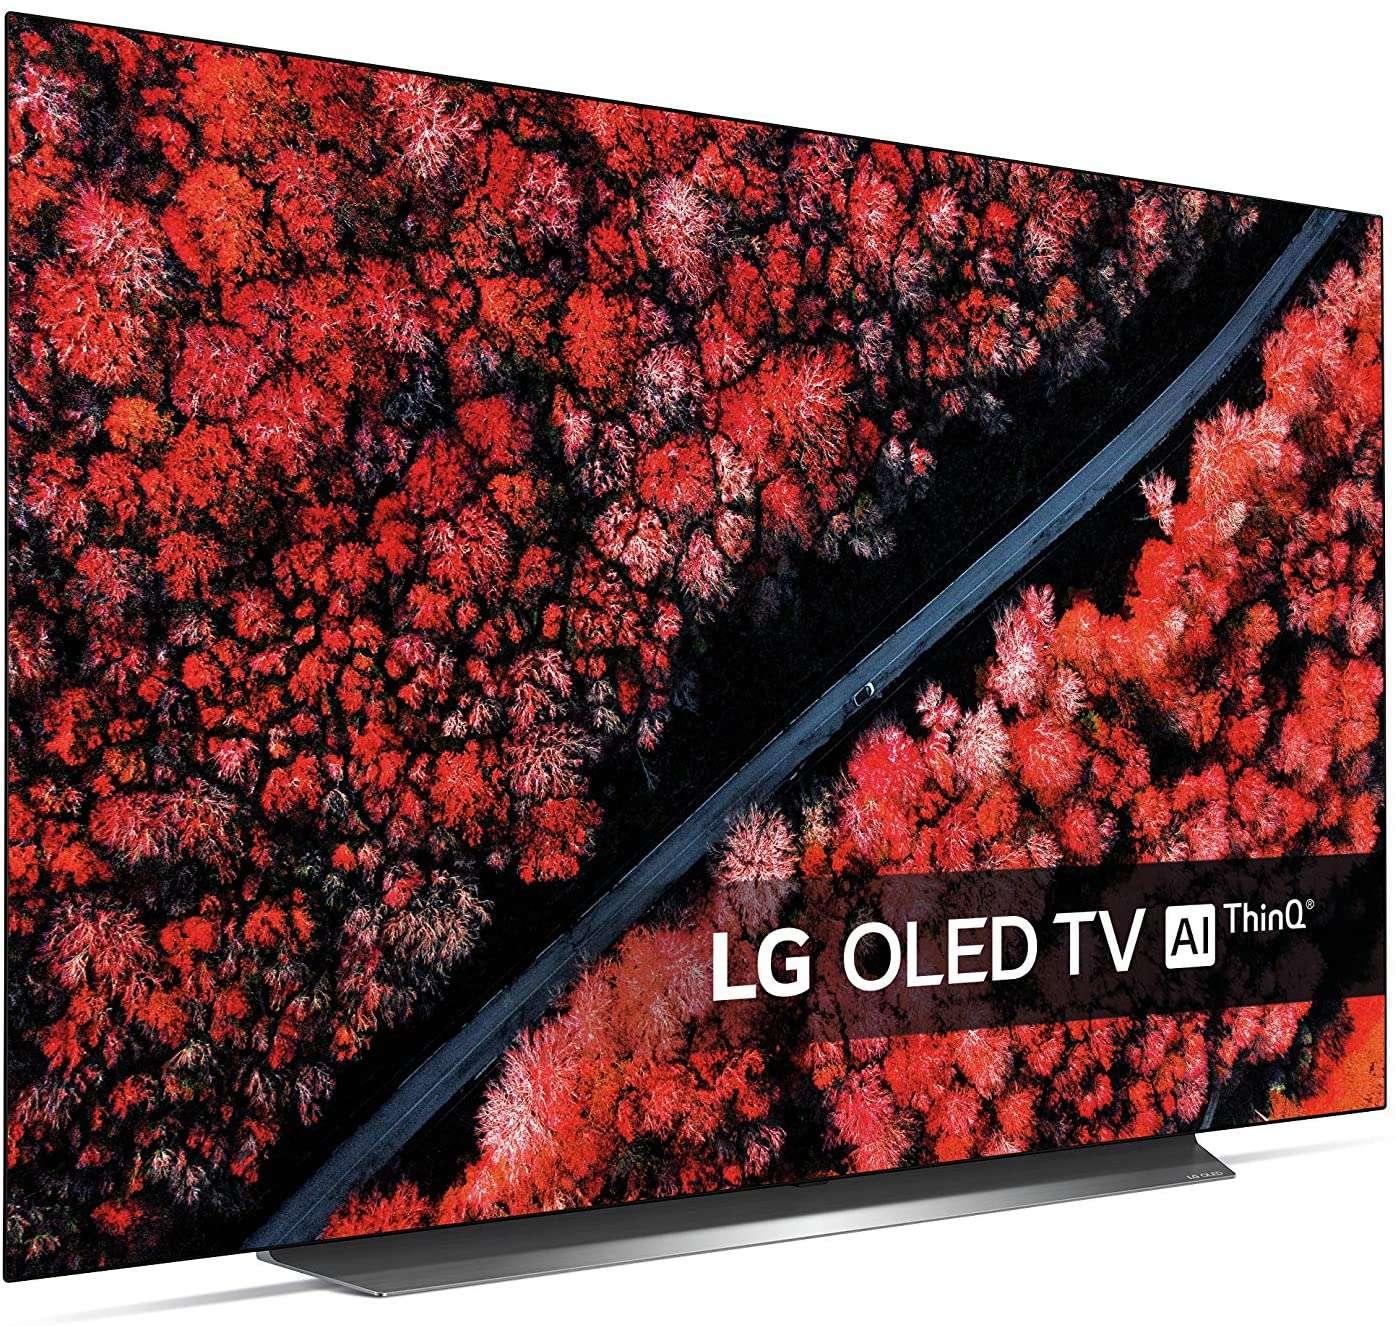 Migliore TV OLED 65 pollici